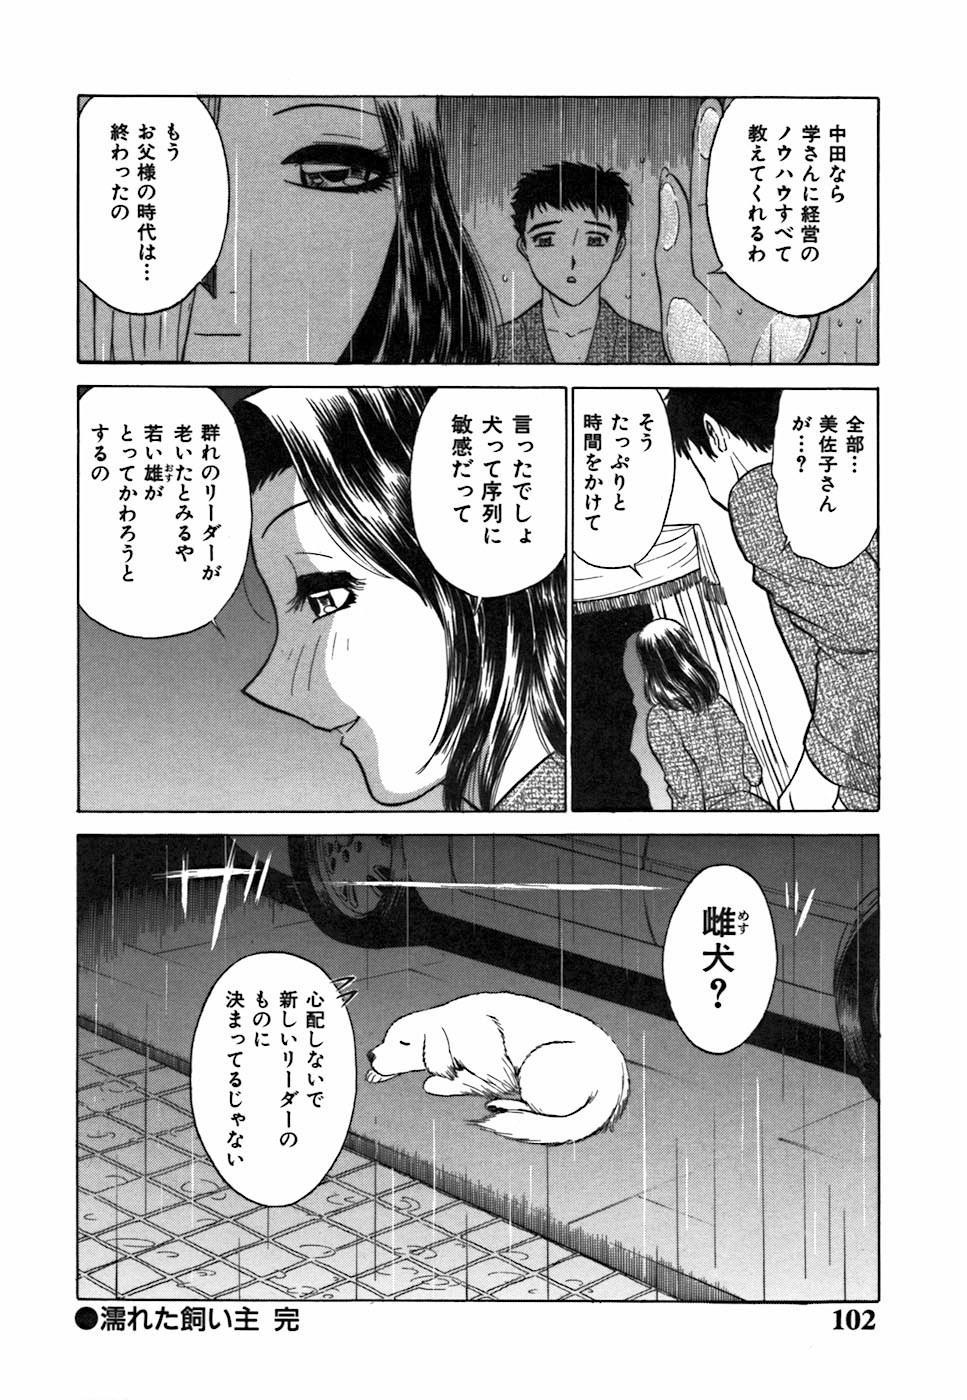 Kimi ga Nozomu Katachi | Appearance for which you hope 101